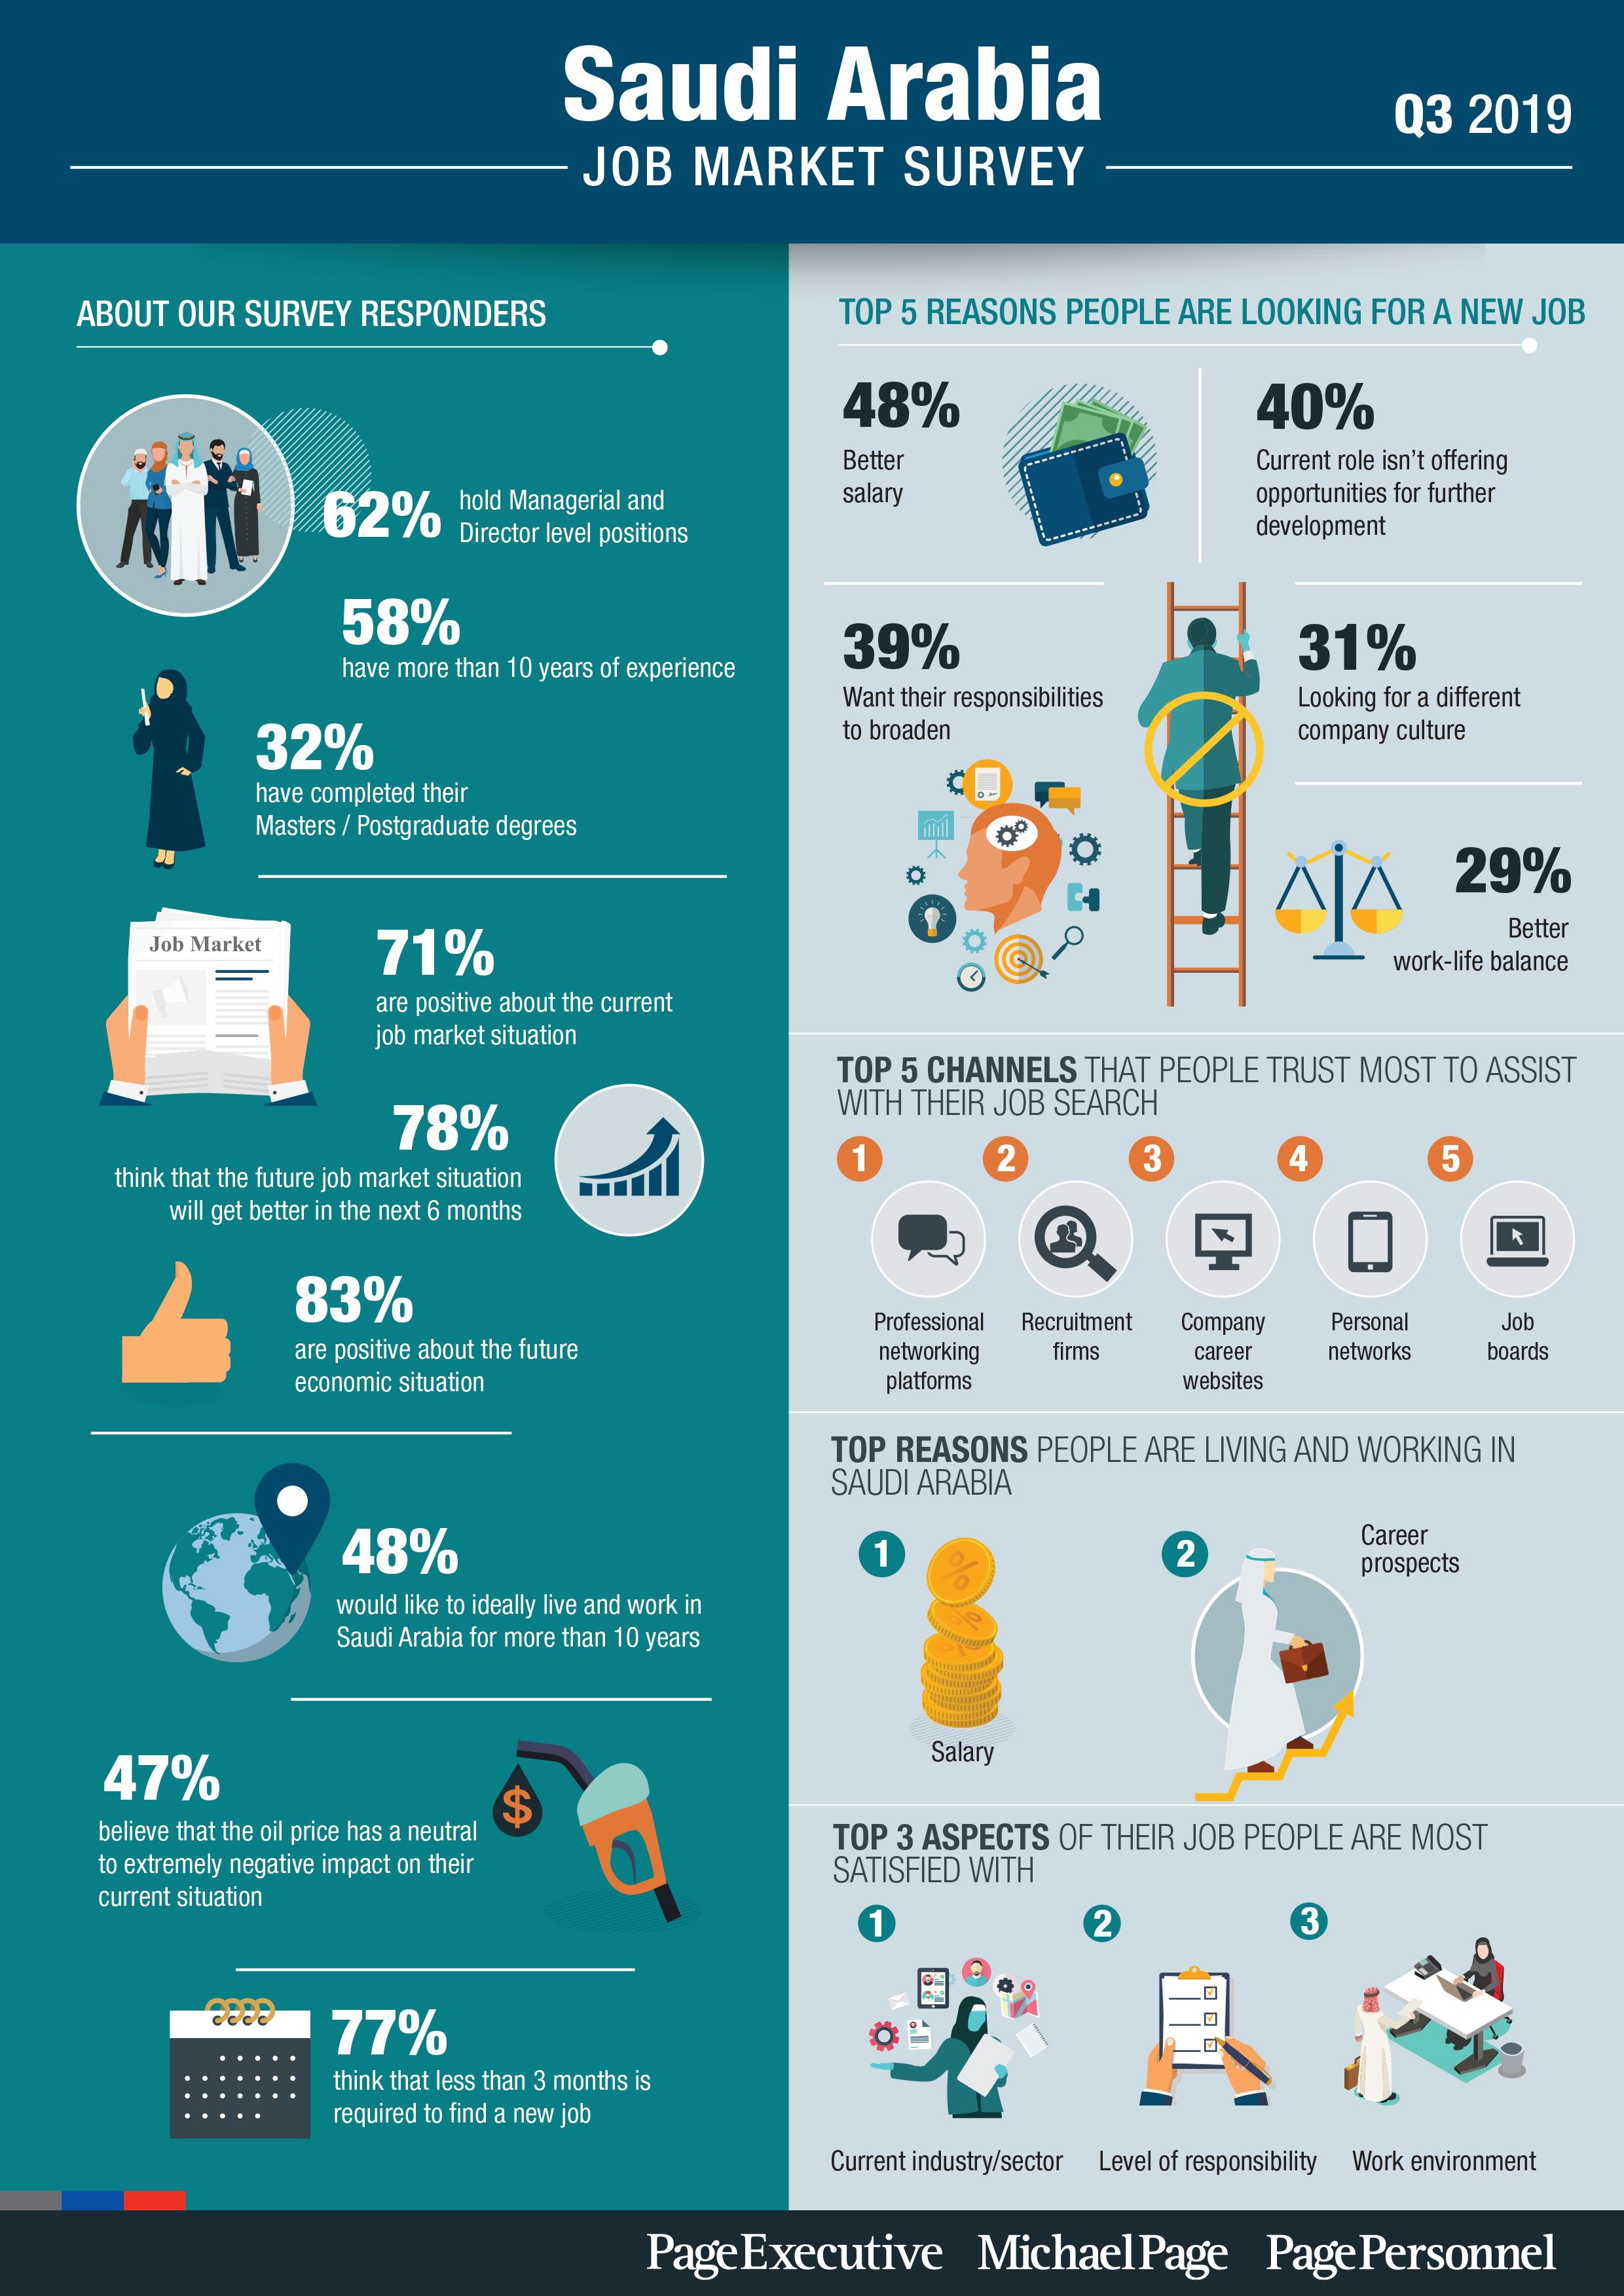 Q3 2019 Job Market Survey - Saudi Arabia